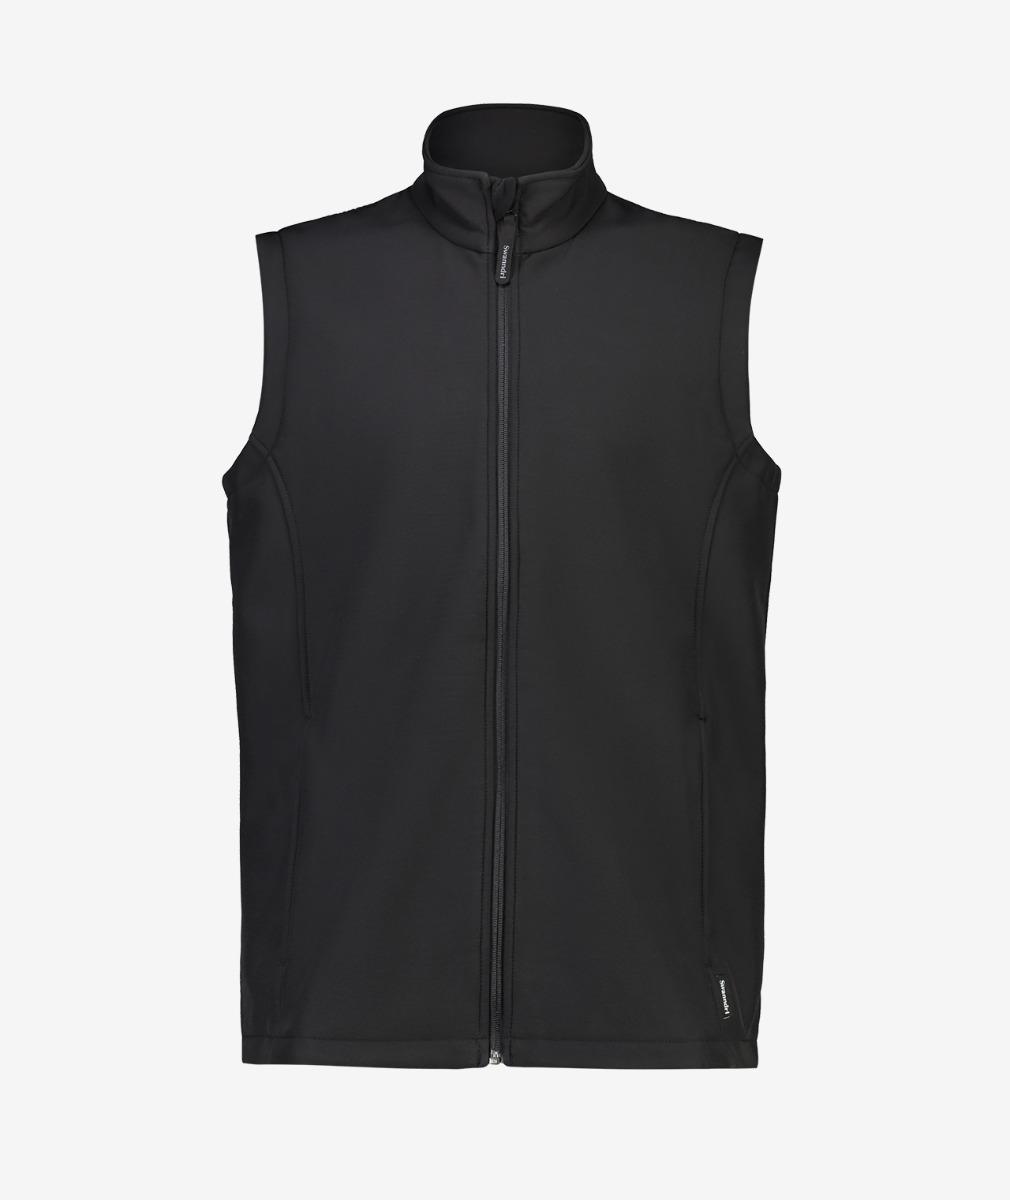 Swanndri Men's Coleman Softshell Vest in Black